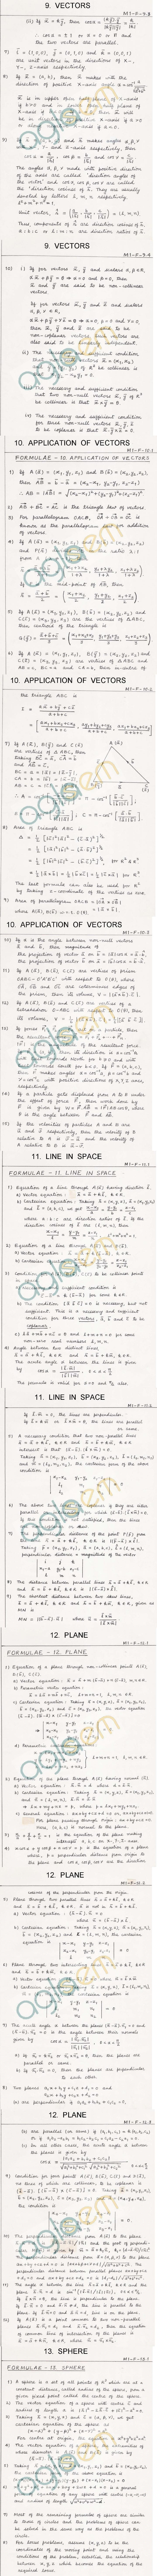 DTU: Notes - 1 Sem MathsI - Mathematics 1 Formulae